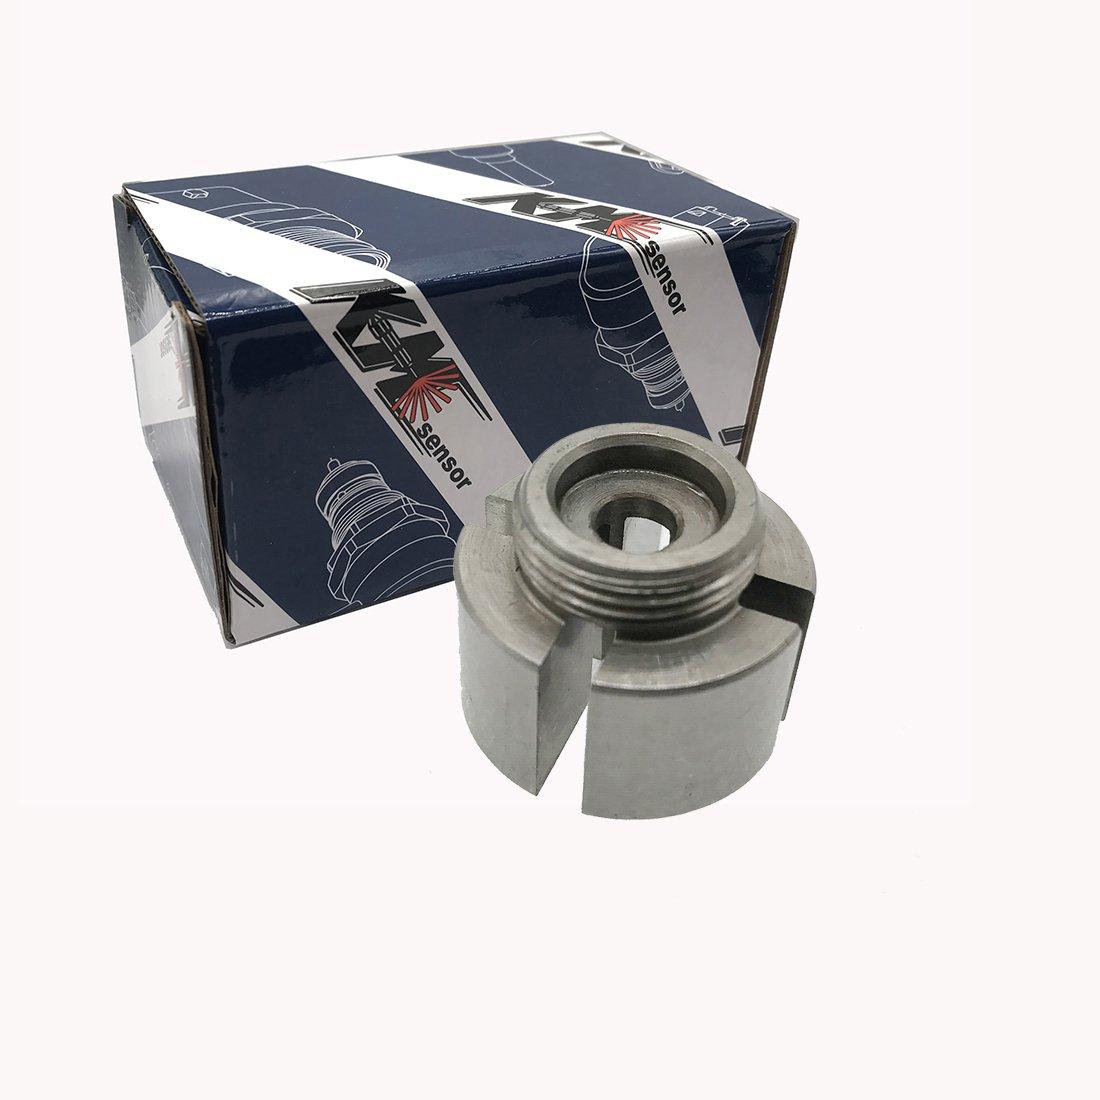 7123-18F rotor nut right handed thread For Lucas CAV DPA, DPC, DP200 and DPS transfer pump